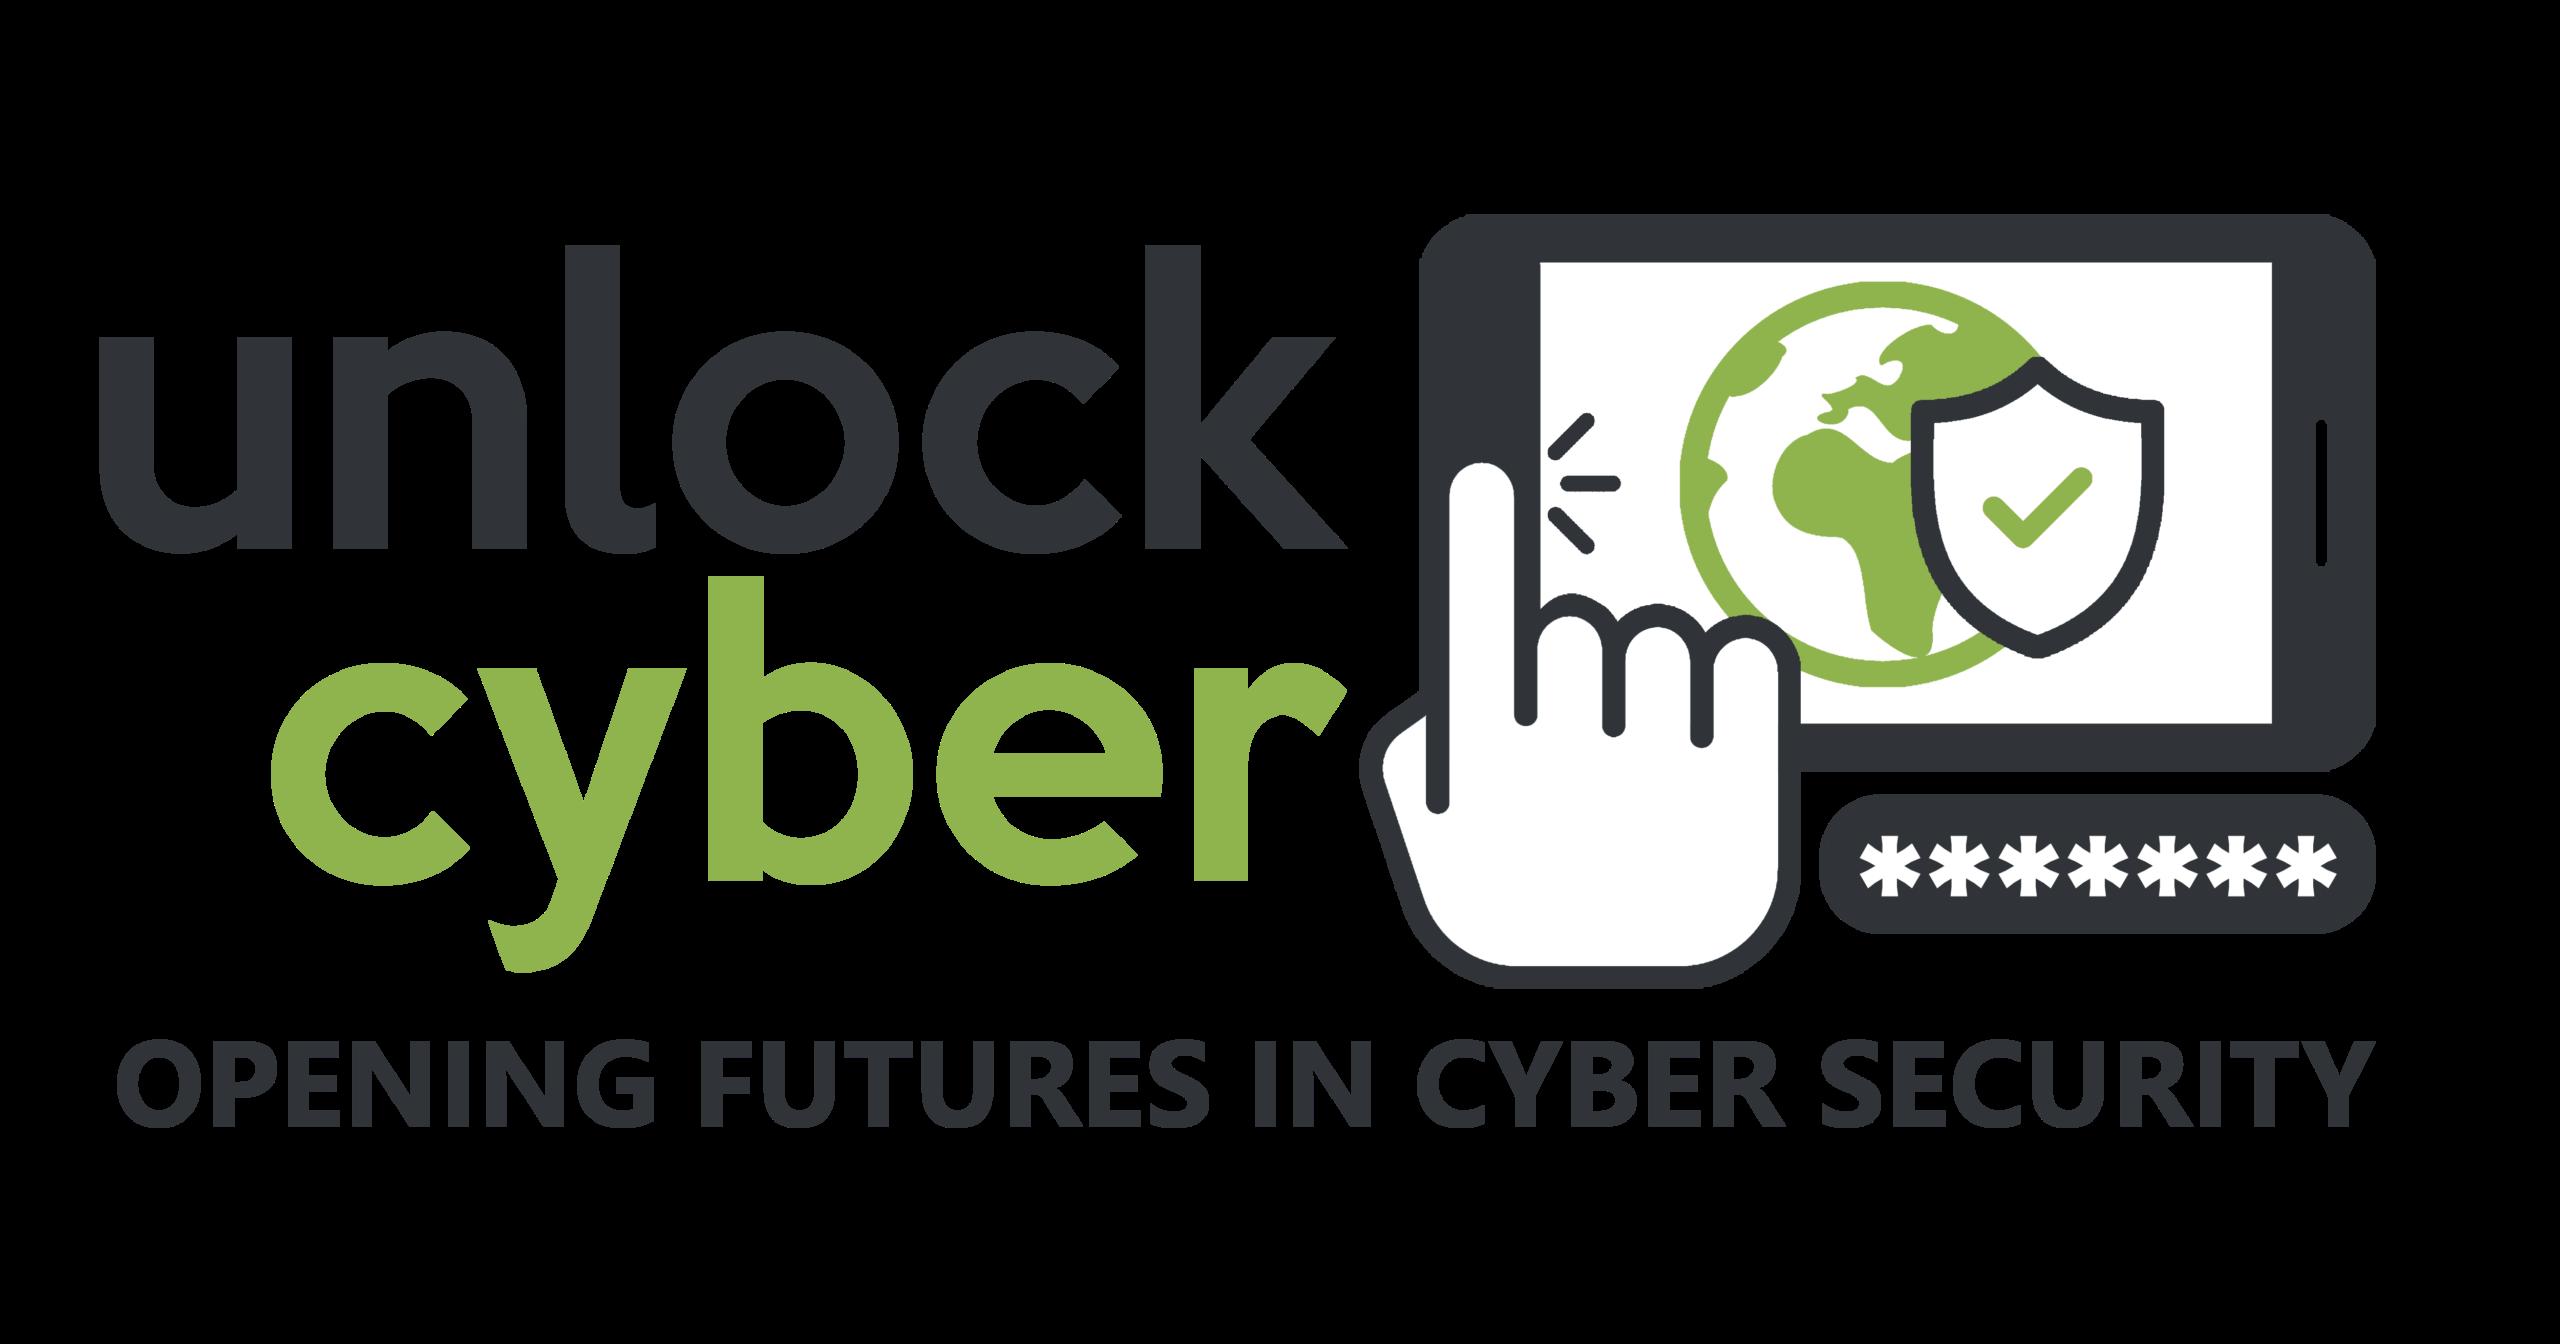 Arcanum Support Cyber Taster Day for Over 300 School Children